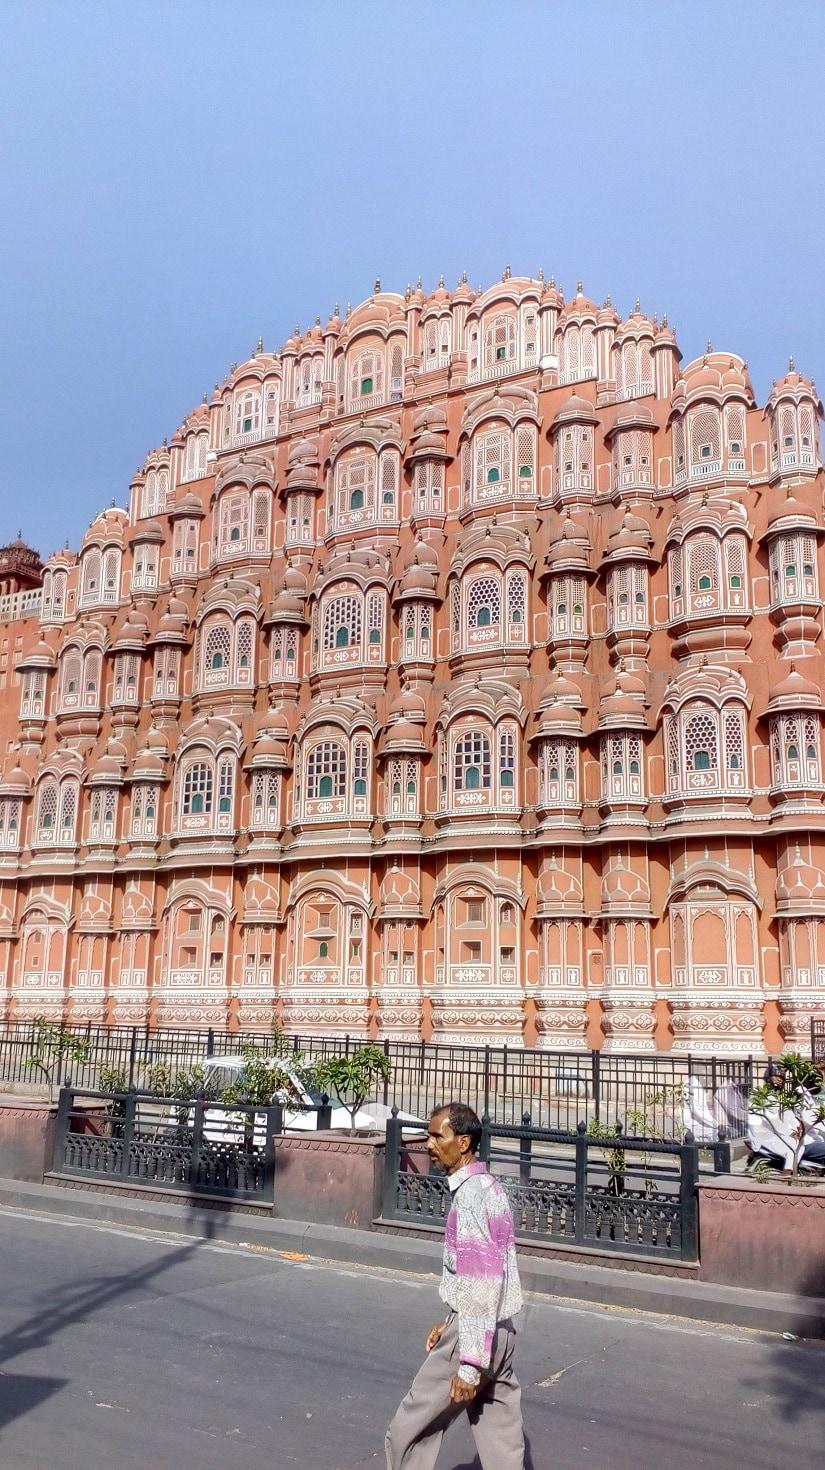 Jaipurs jharokha tourism: Cafes by Hawa Mahal, Amer Fort are social media hotspots